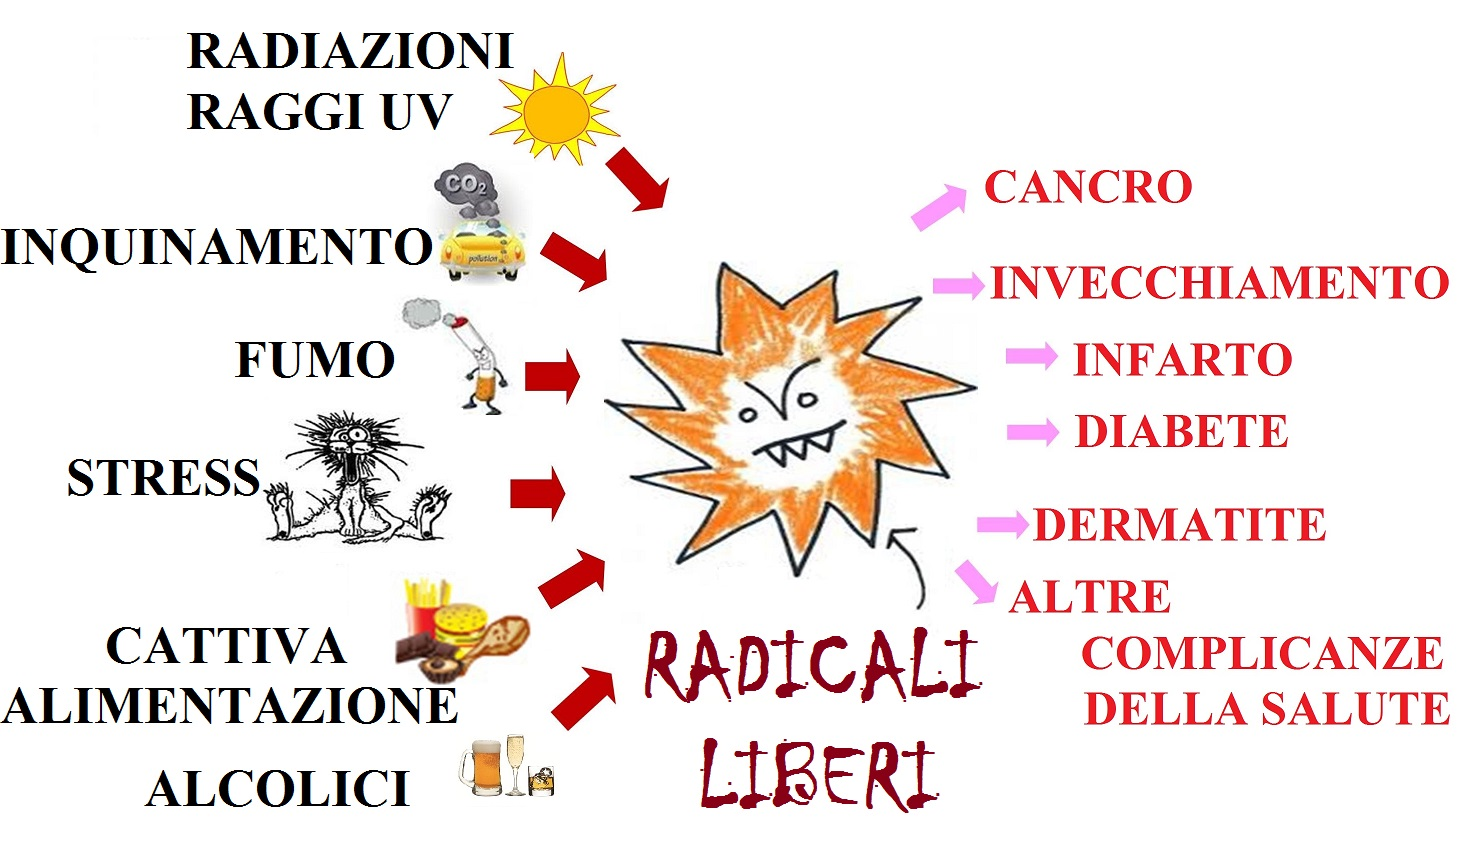 Risultati immagini per radicali liberi